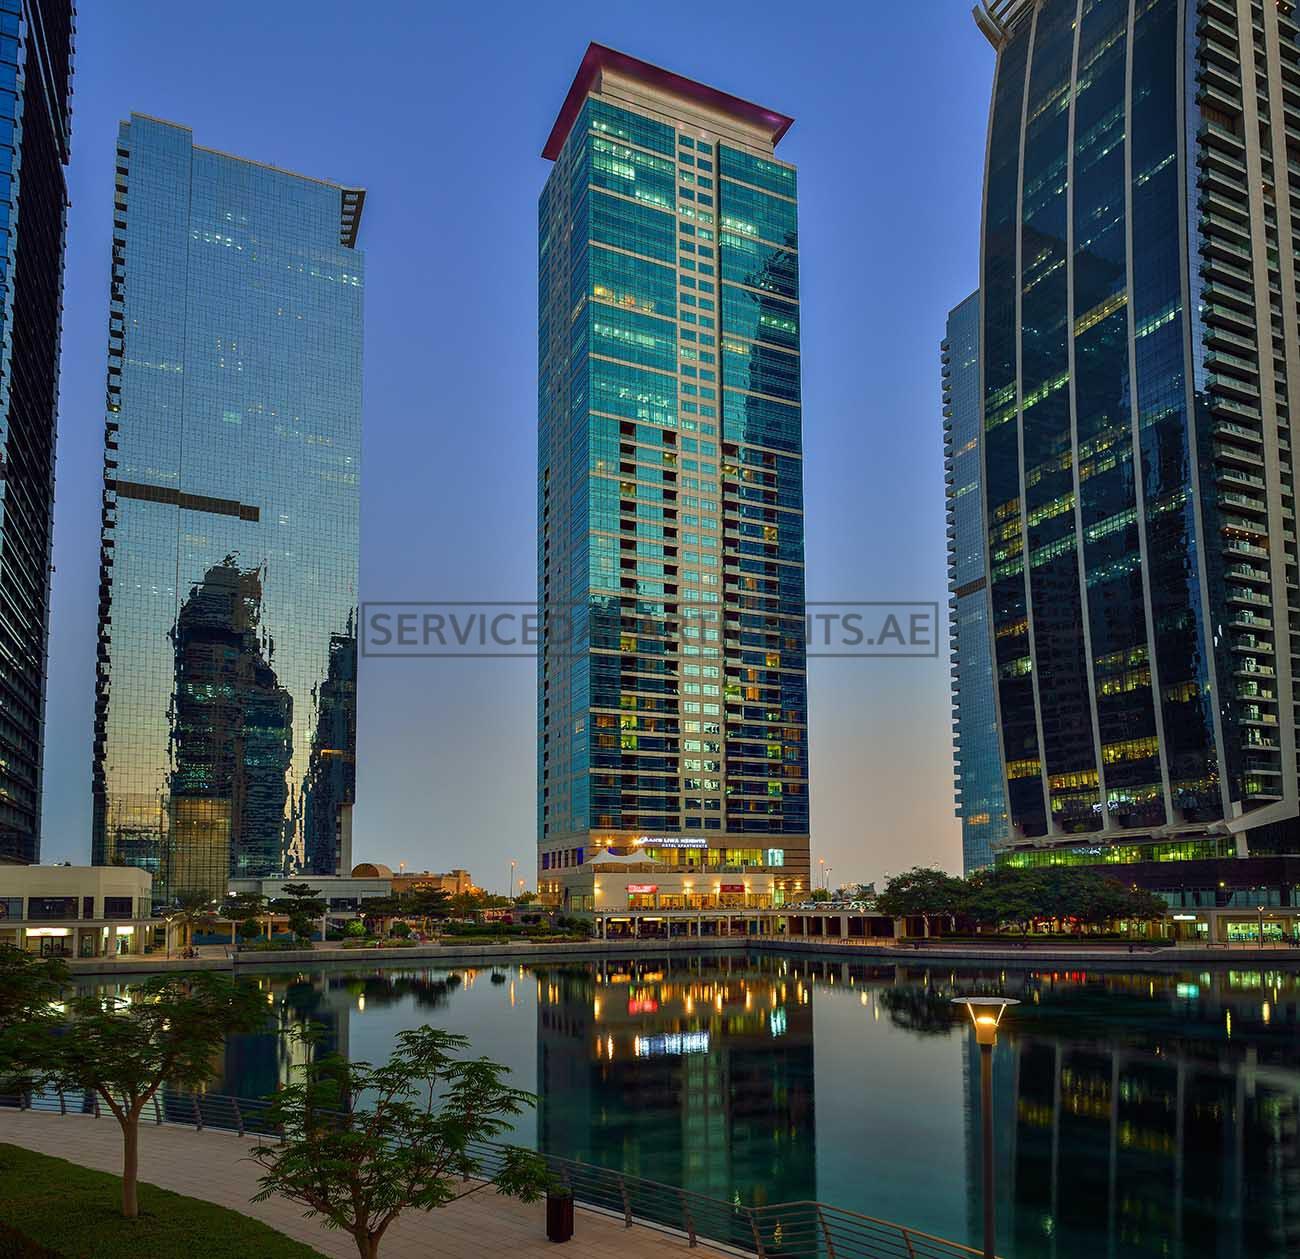 Cheap Apartments For Rent Dubai: 1 Bedroom Serviced Hotel Apartments For Rent In Dubai